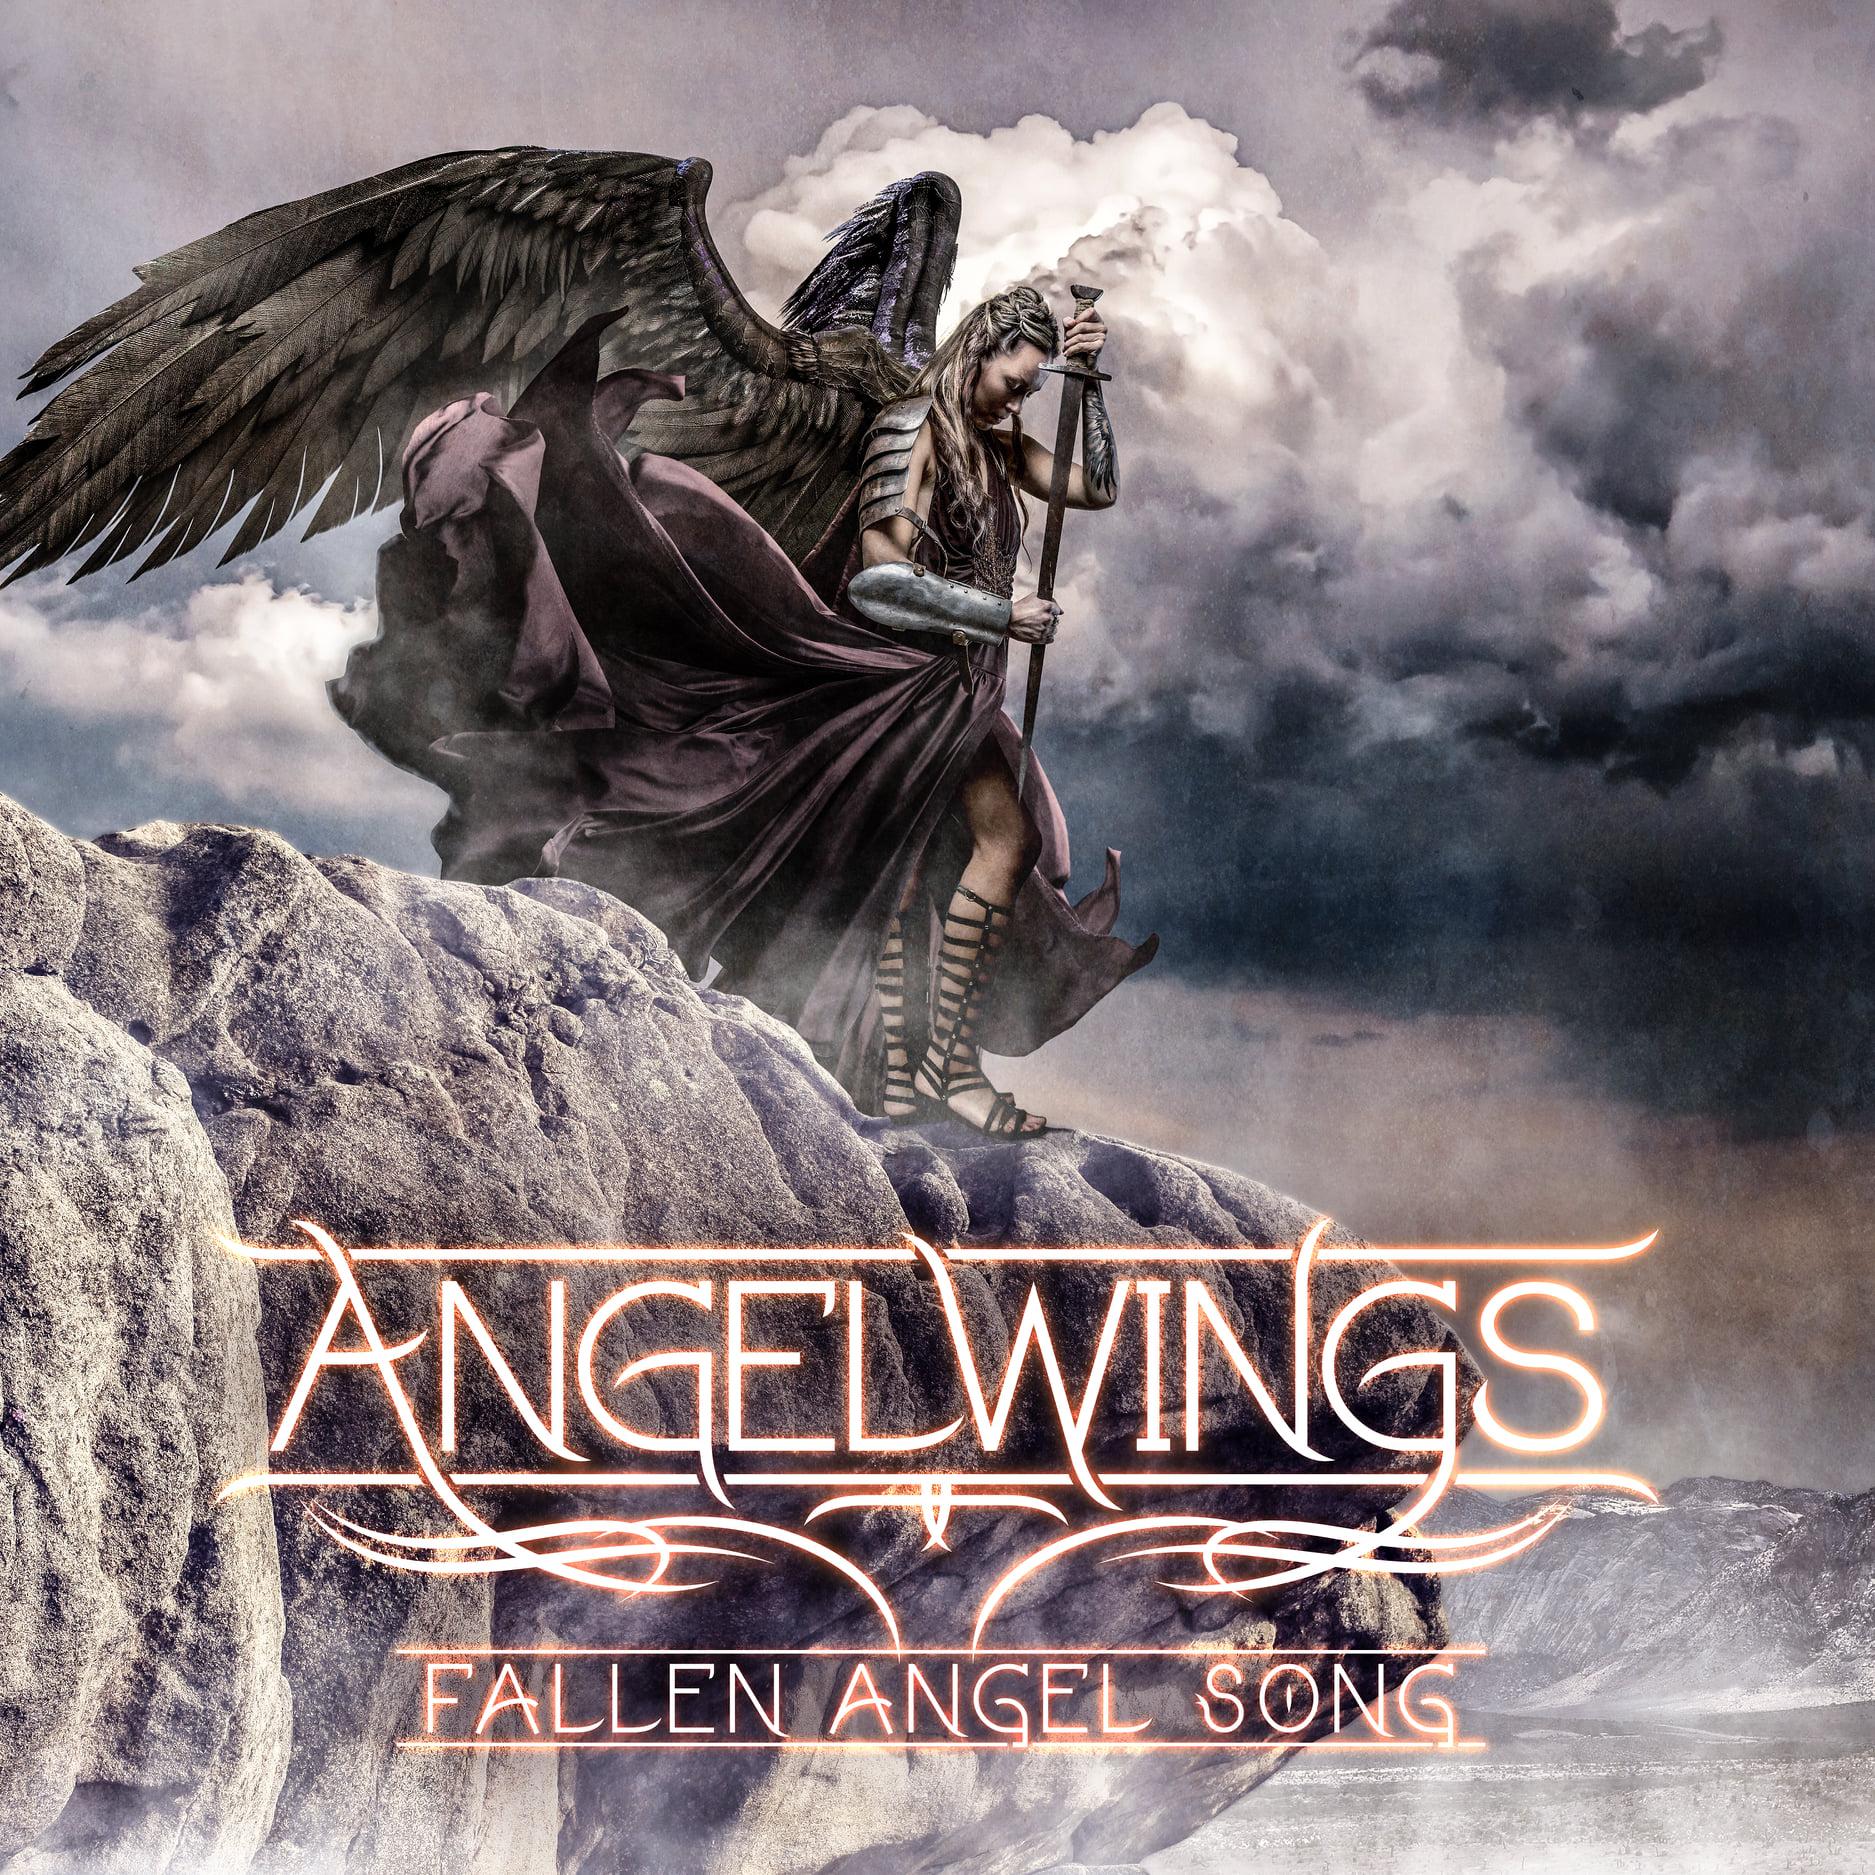 ANGELWINGS - single